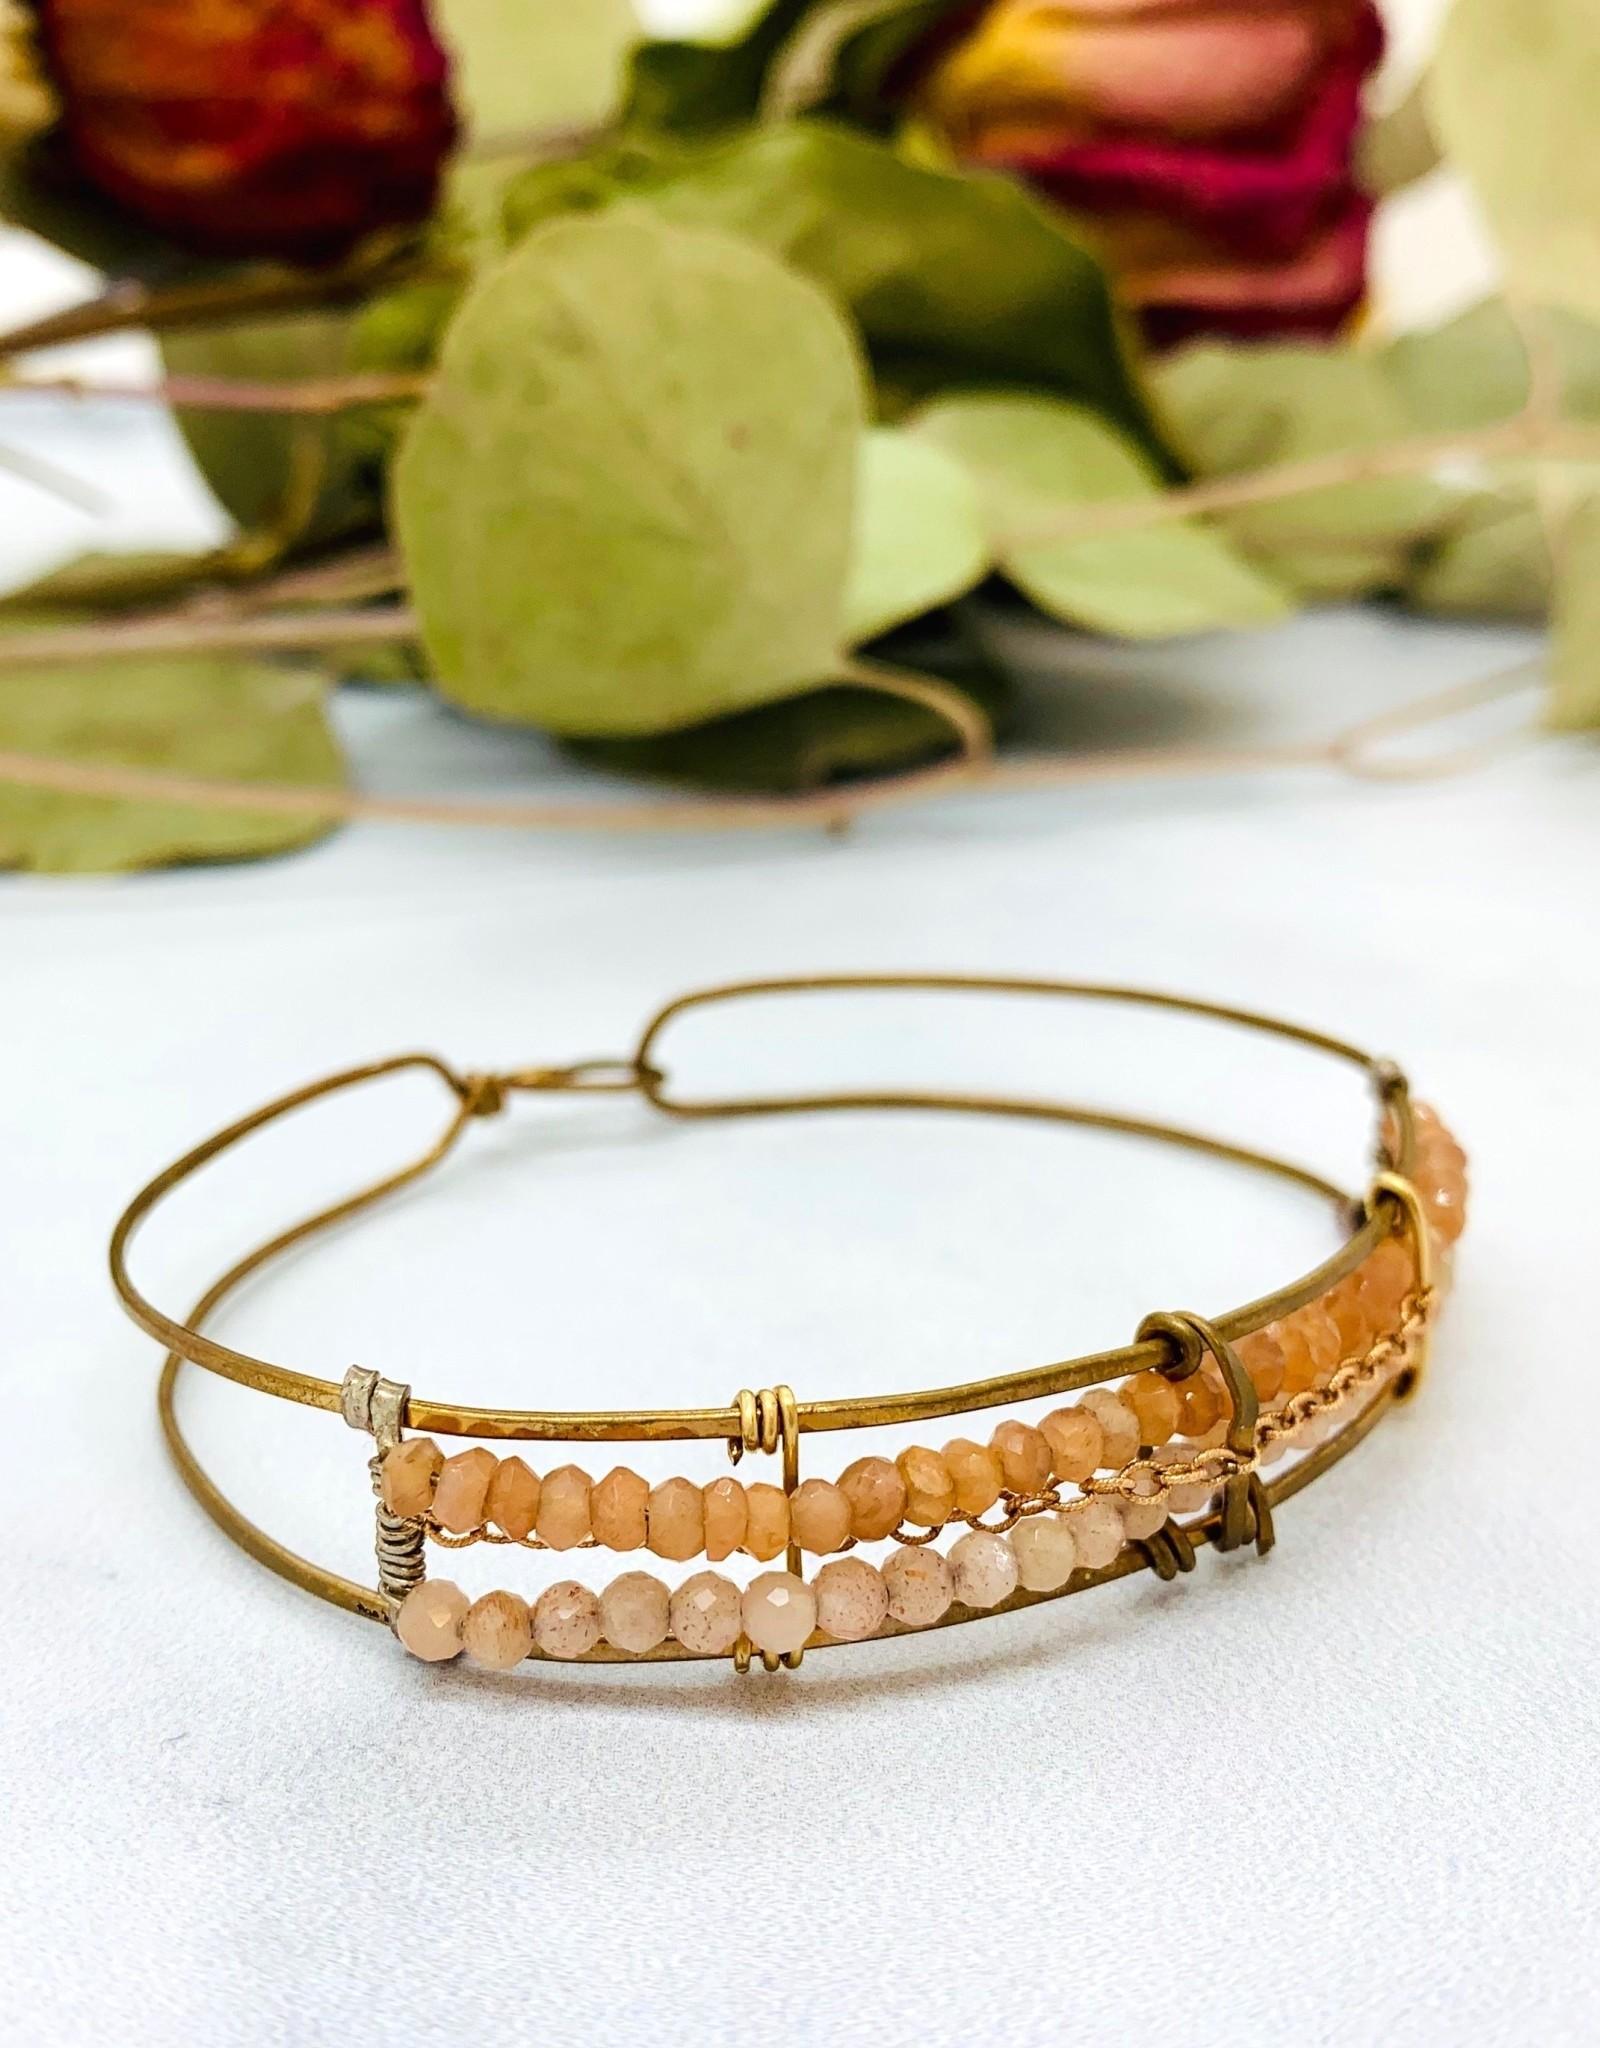 Handmade peach moonstone and rose gold filled chain beaded on hand formed bronze bracelet.